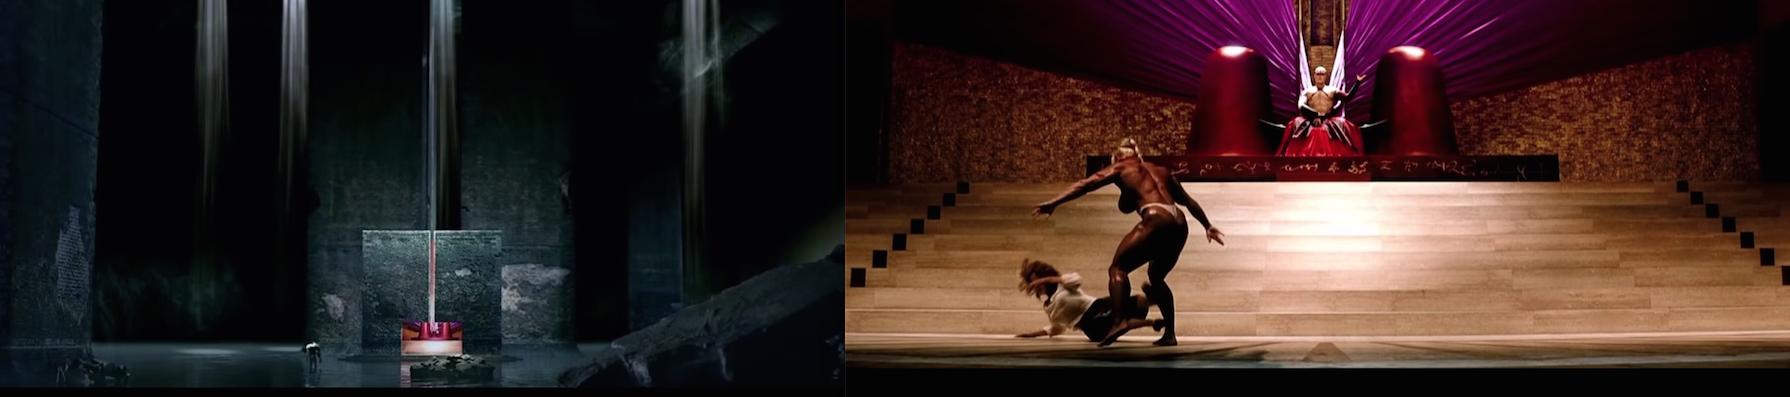 Kim Chizevsky-Nicholls The Cell Appearance 5